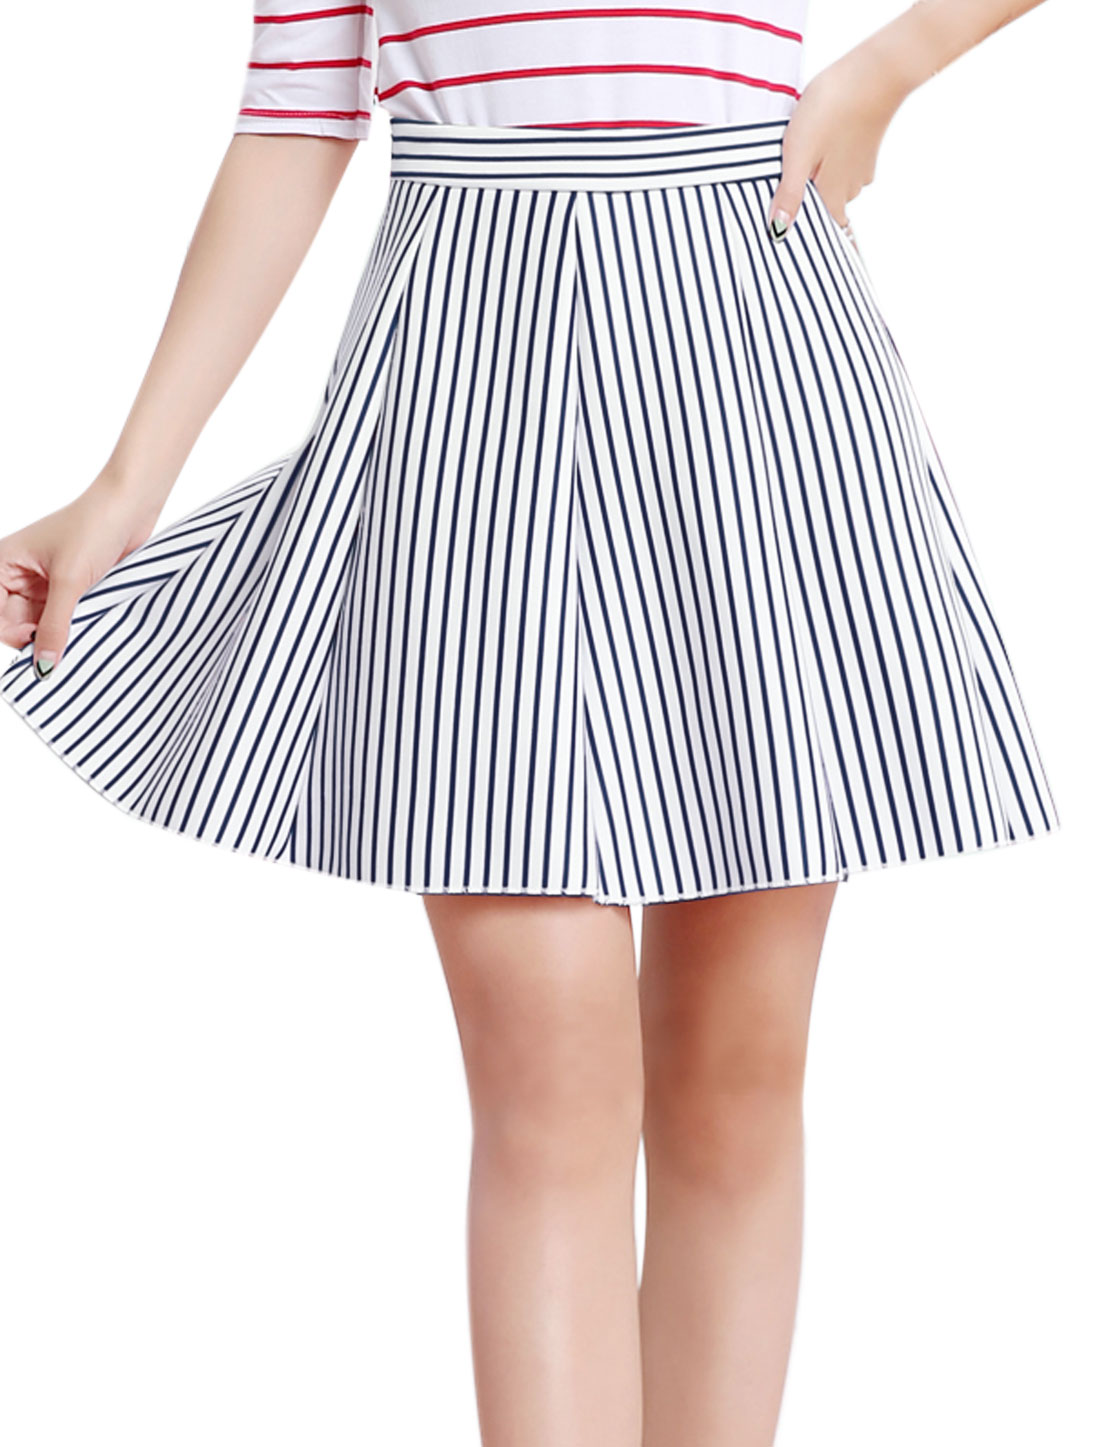 Women High Waist Pleated Stripes Print A Line Skort Blue M